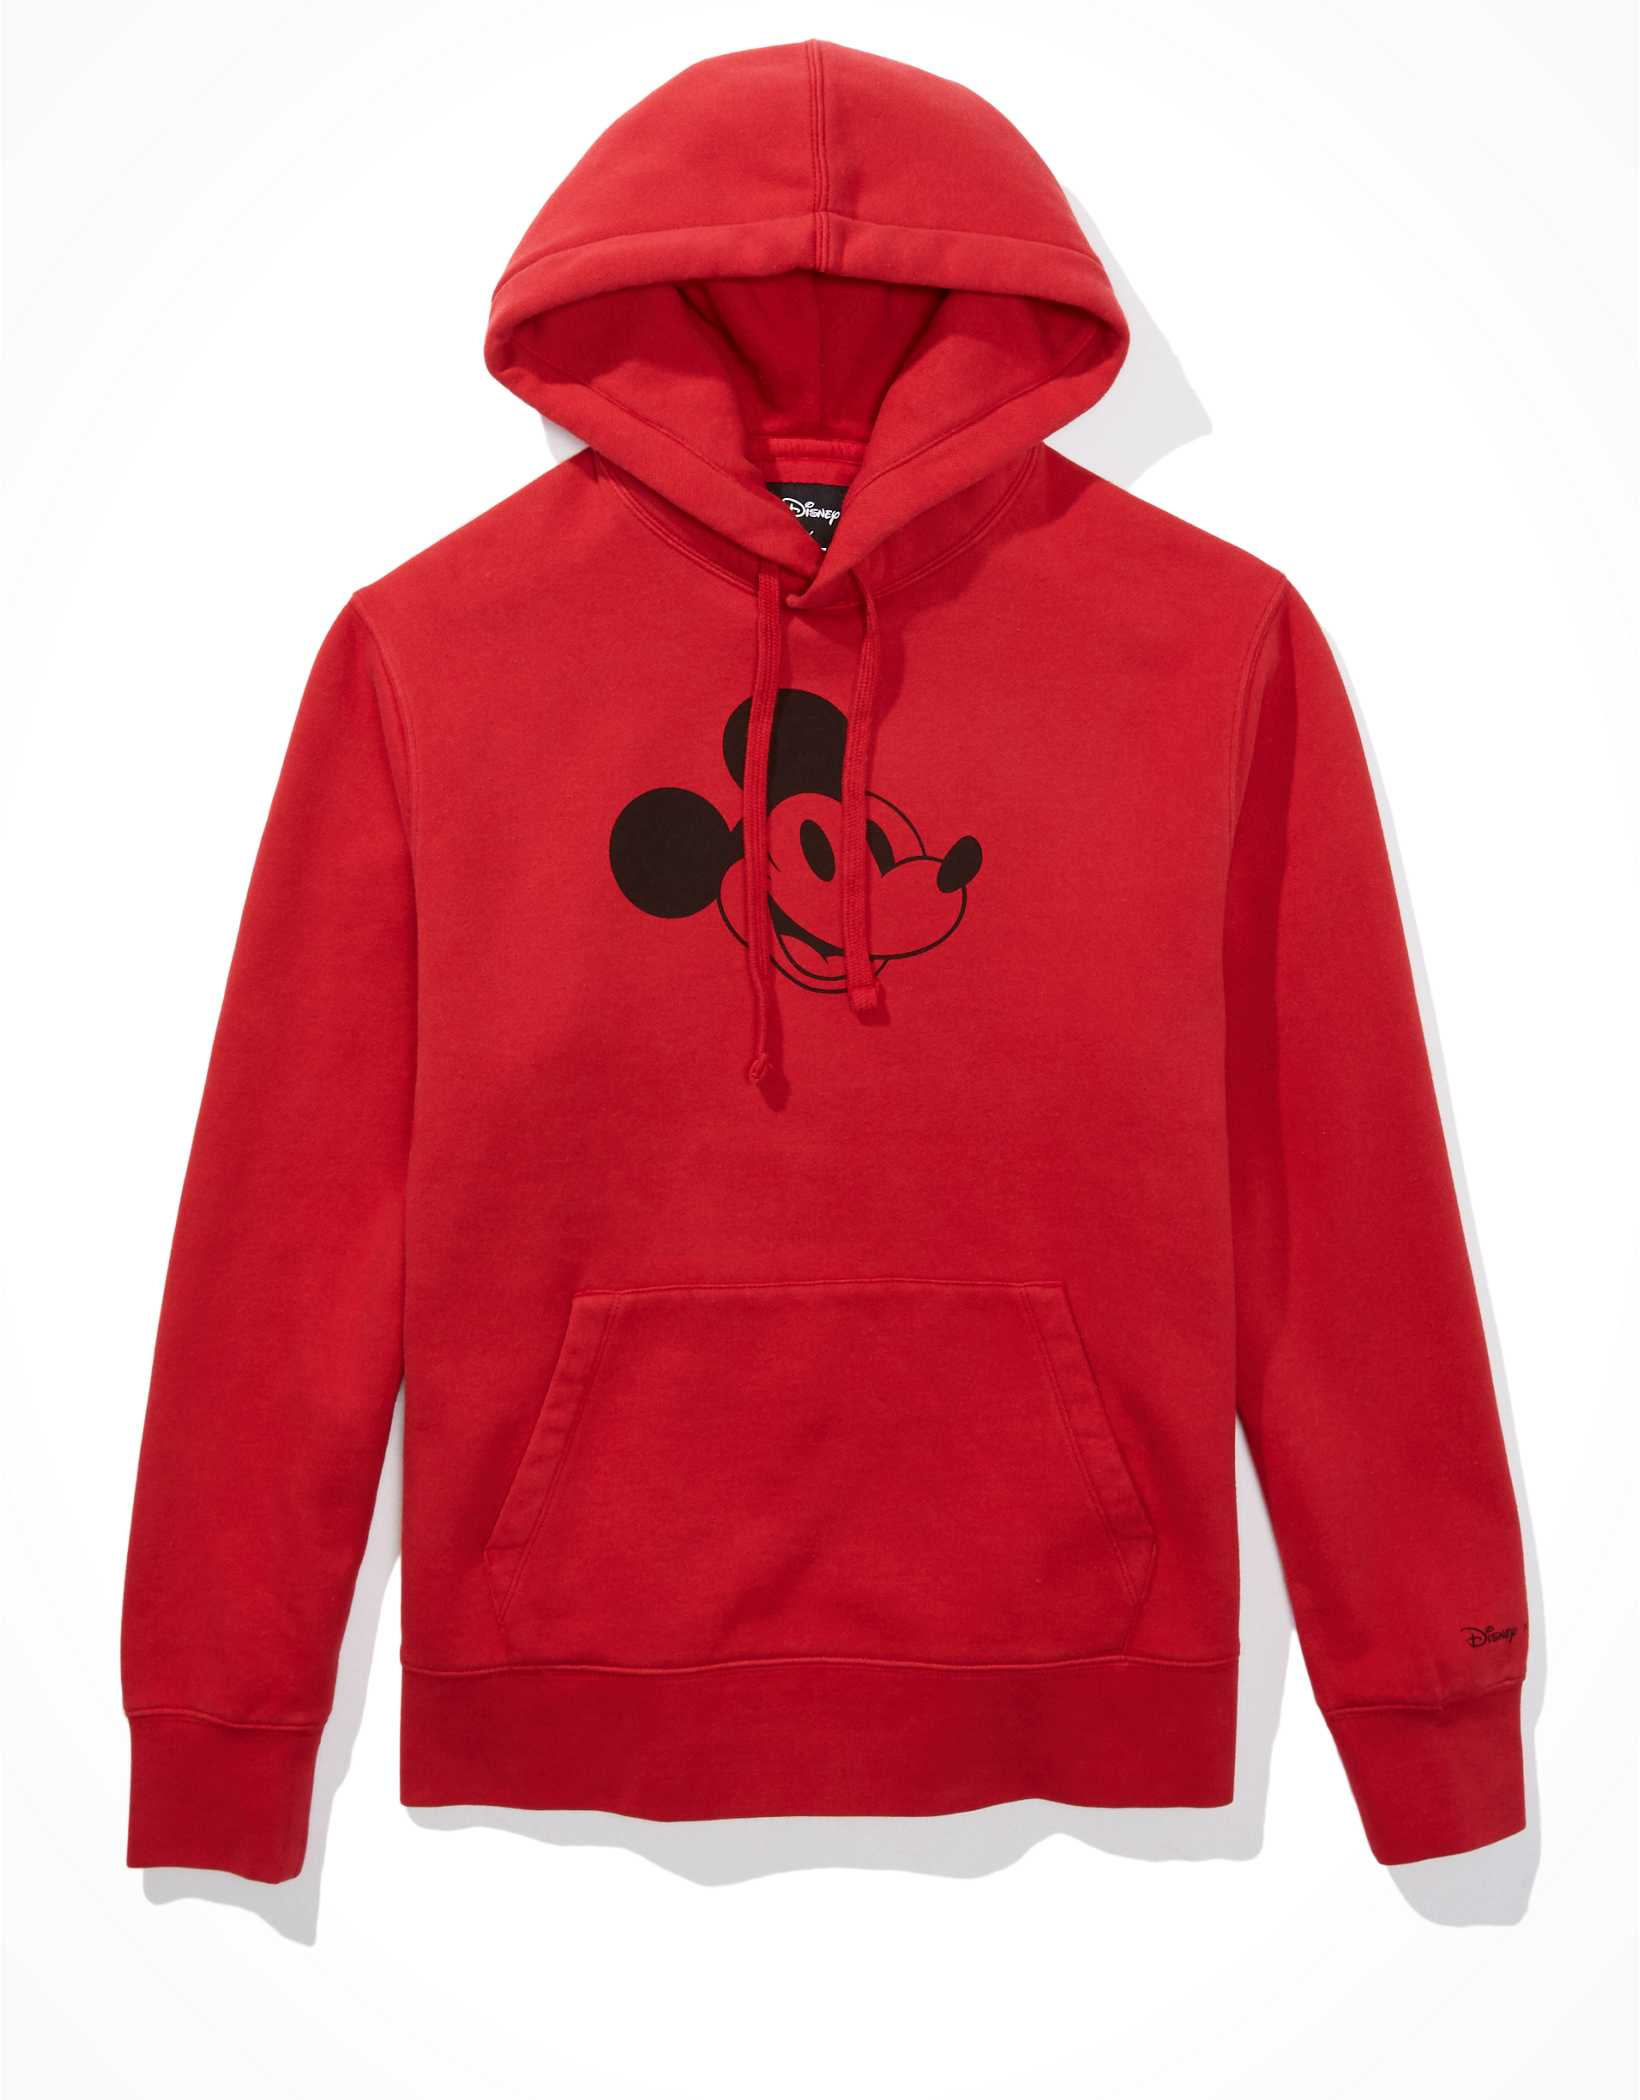 Disney X AE Super Soft Fleece Hoodie